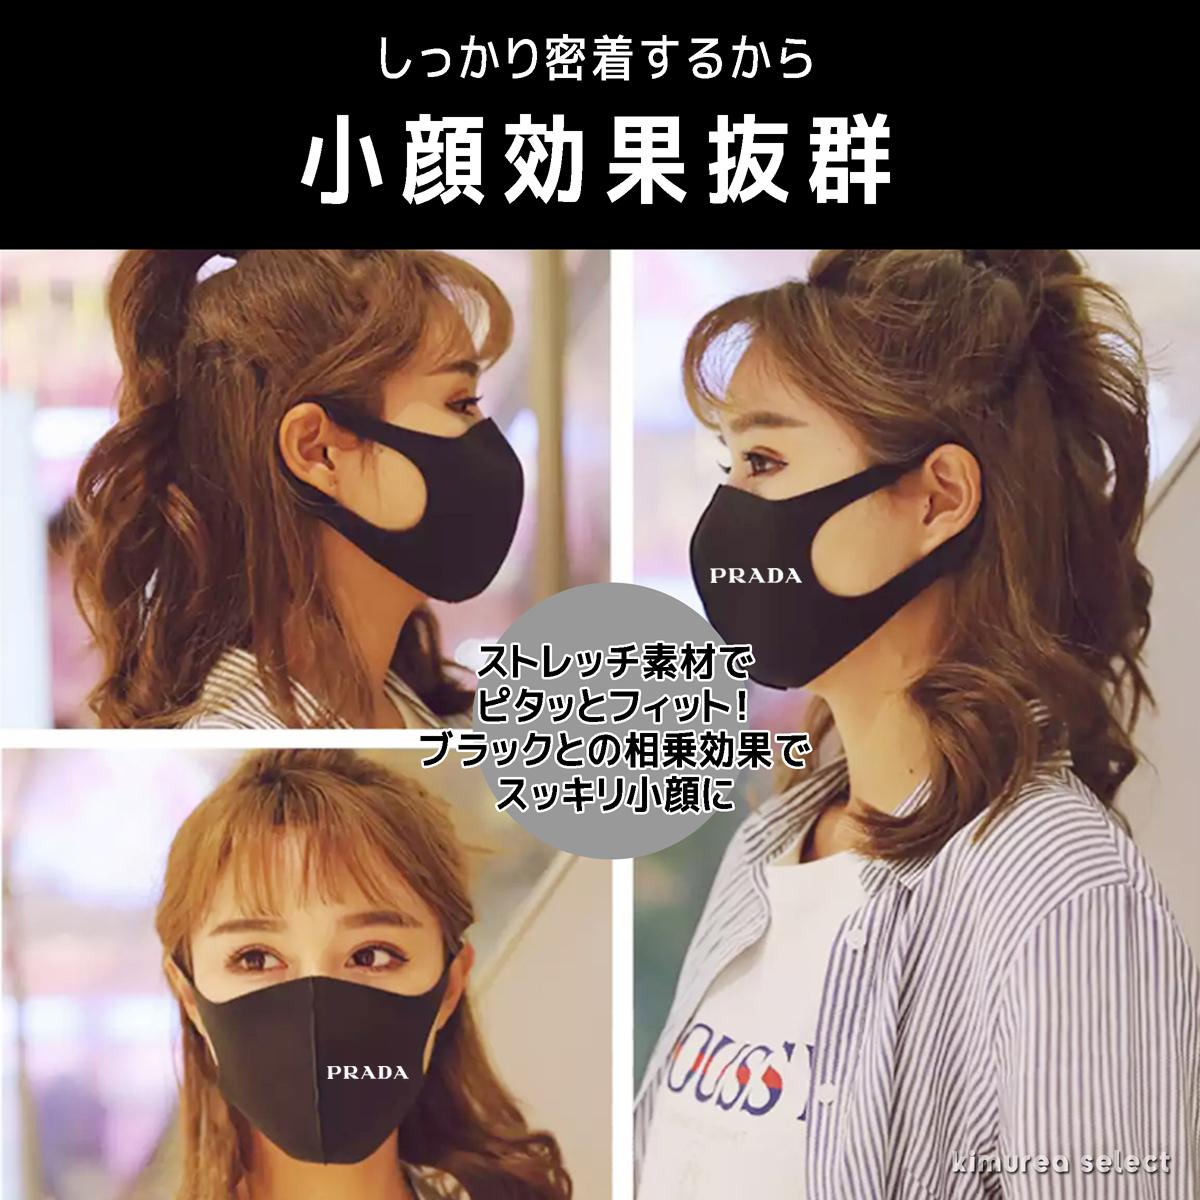 PRADA facemask covid-19